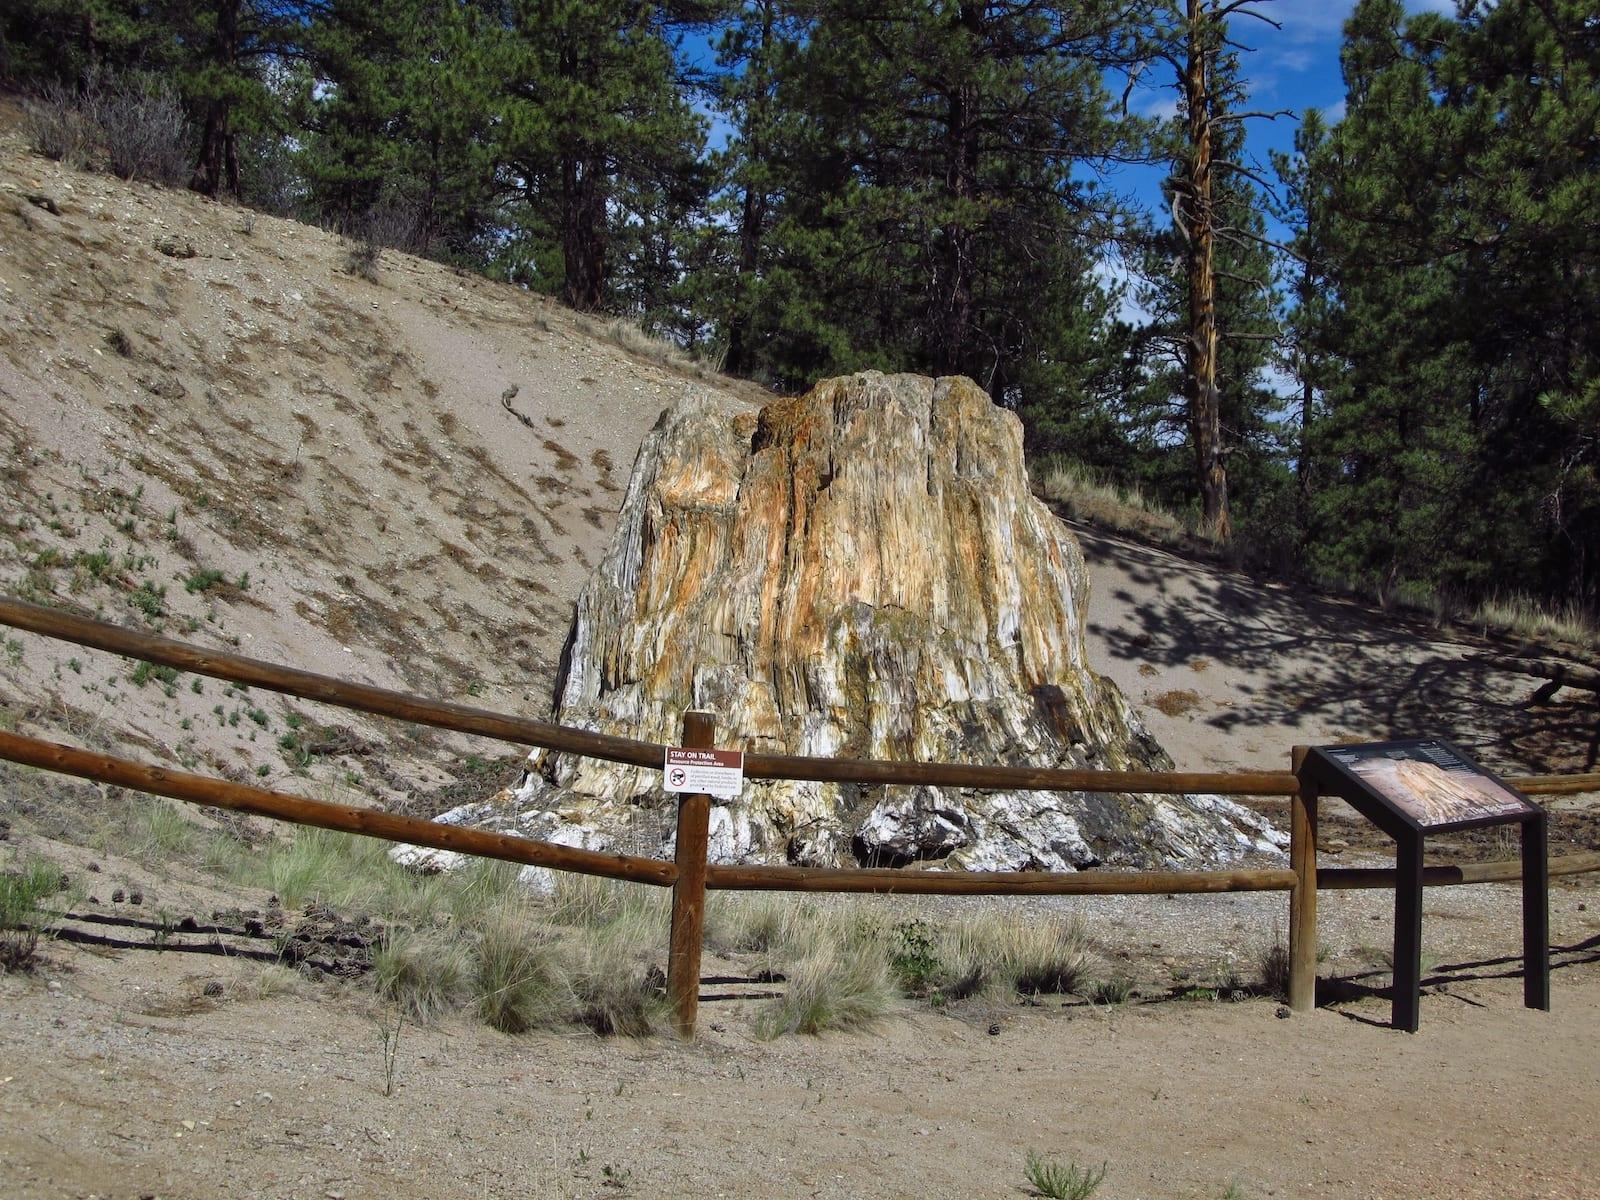 Florissant Fossil Beds National Monument Tre Stump